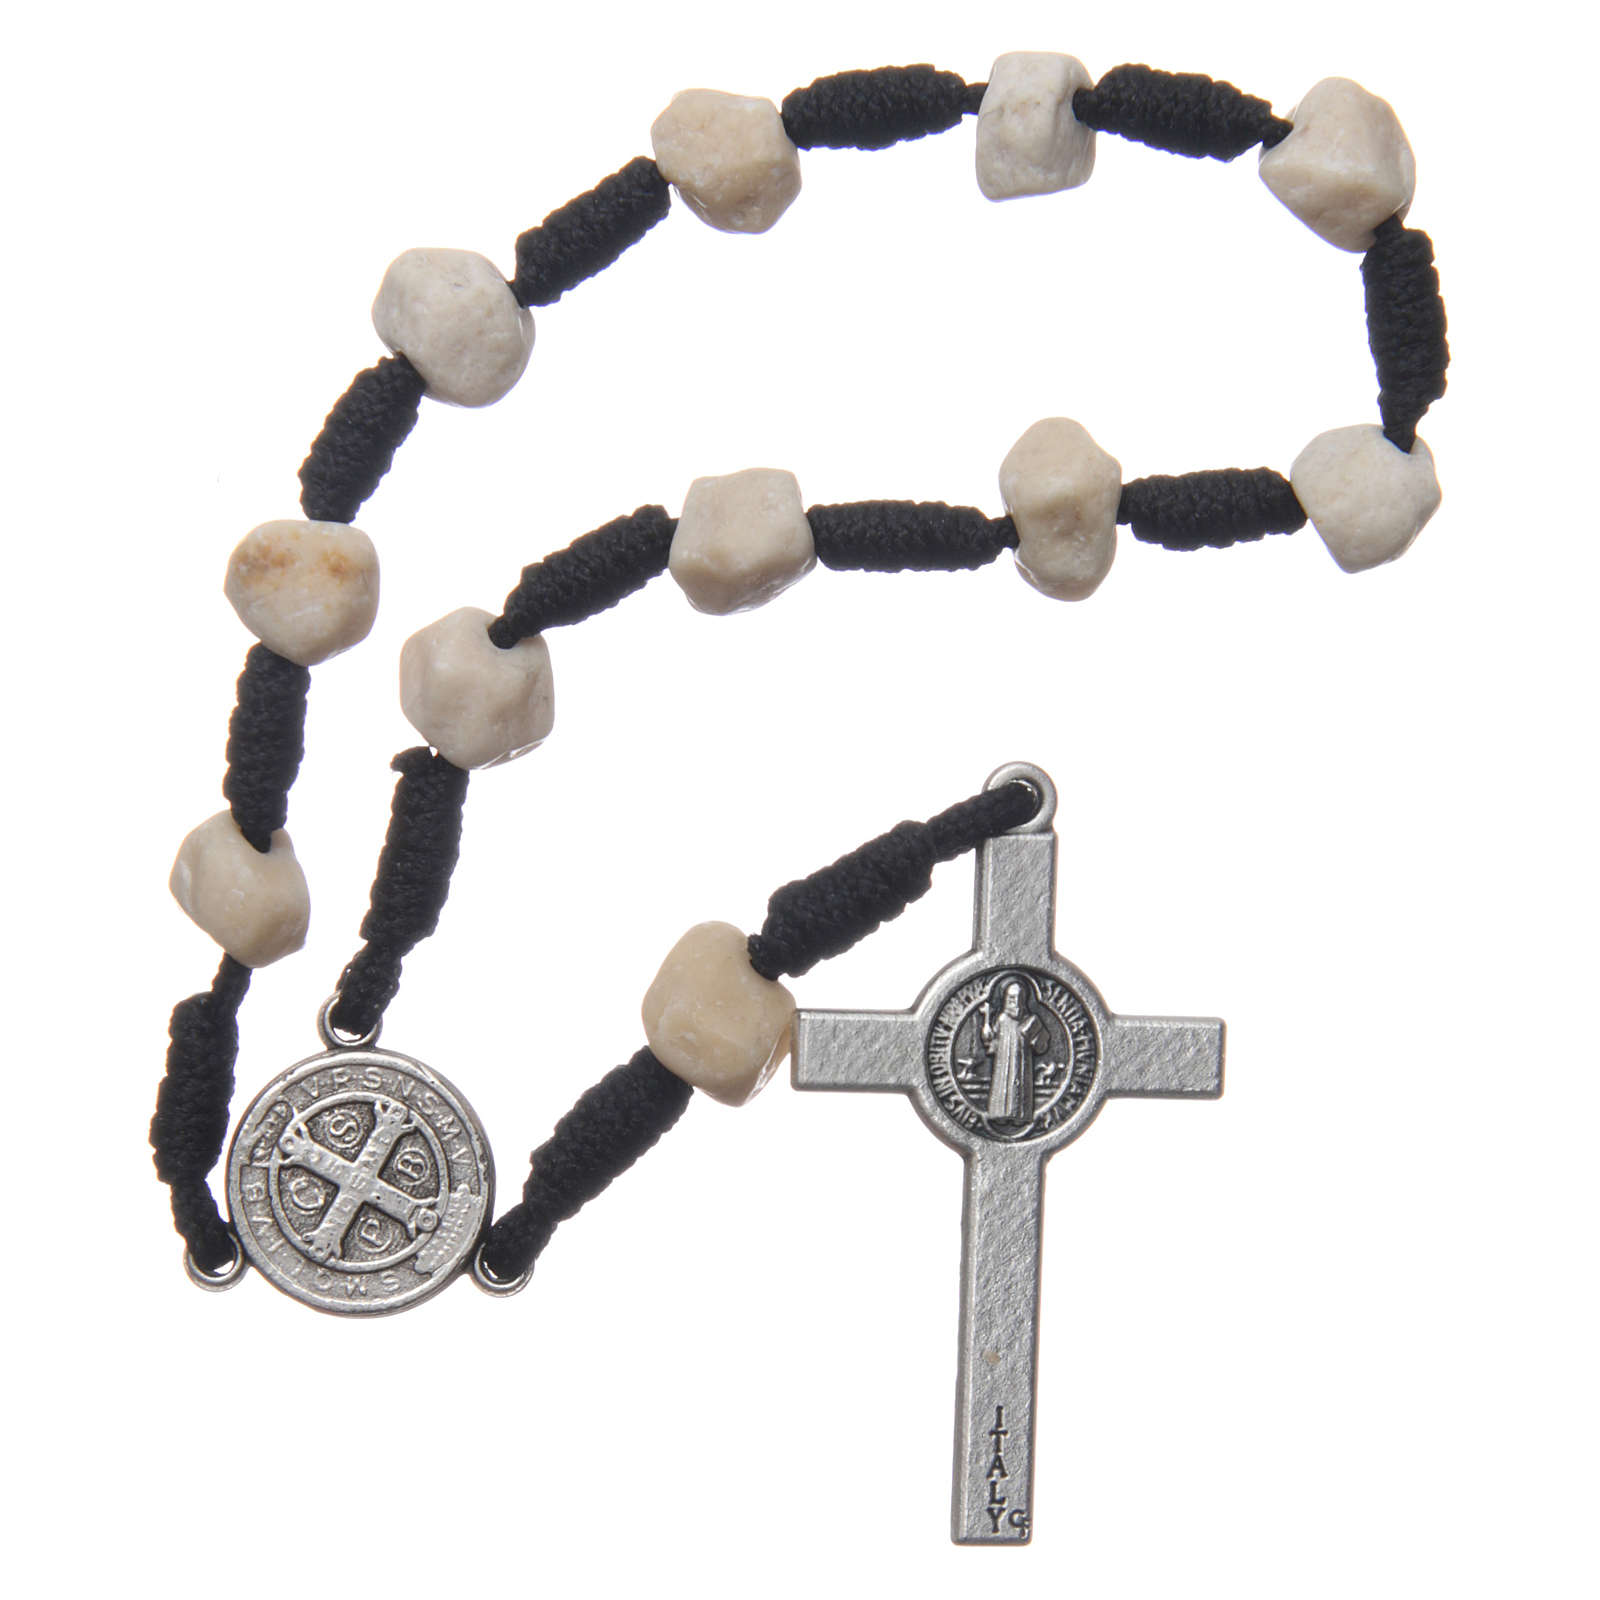 Medjugorje single decade bracelet with stone grains and Saint Benedict crucifix 4